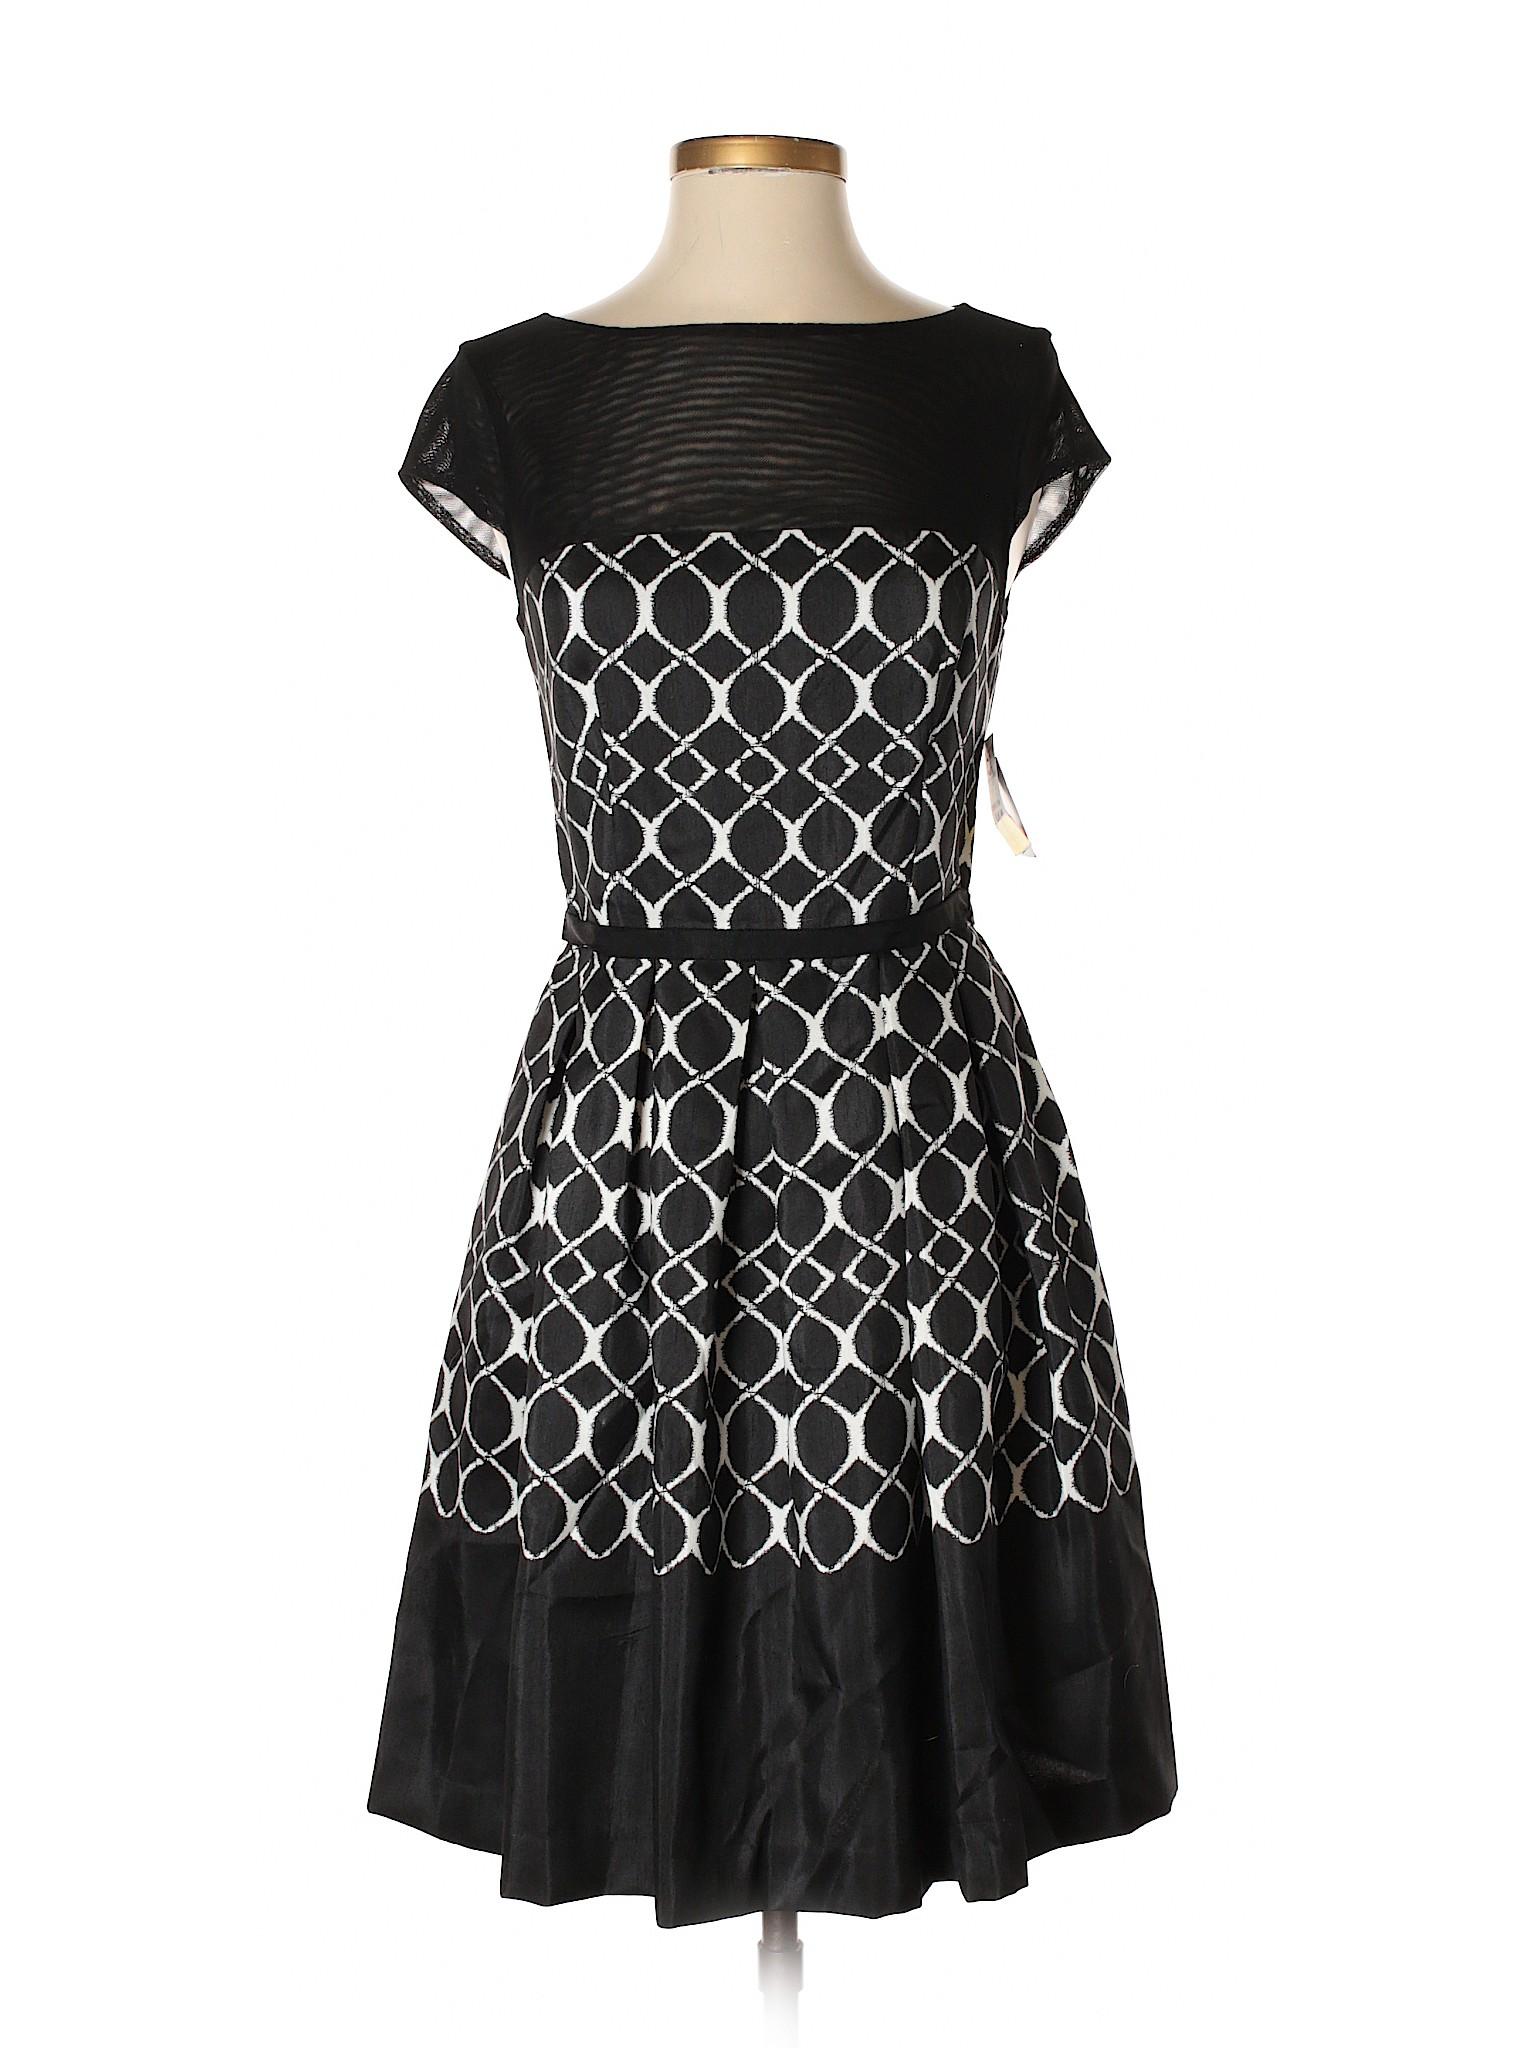 Boutique Just Casual Dress Taylor winter qr5pAwq1